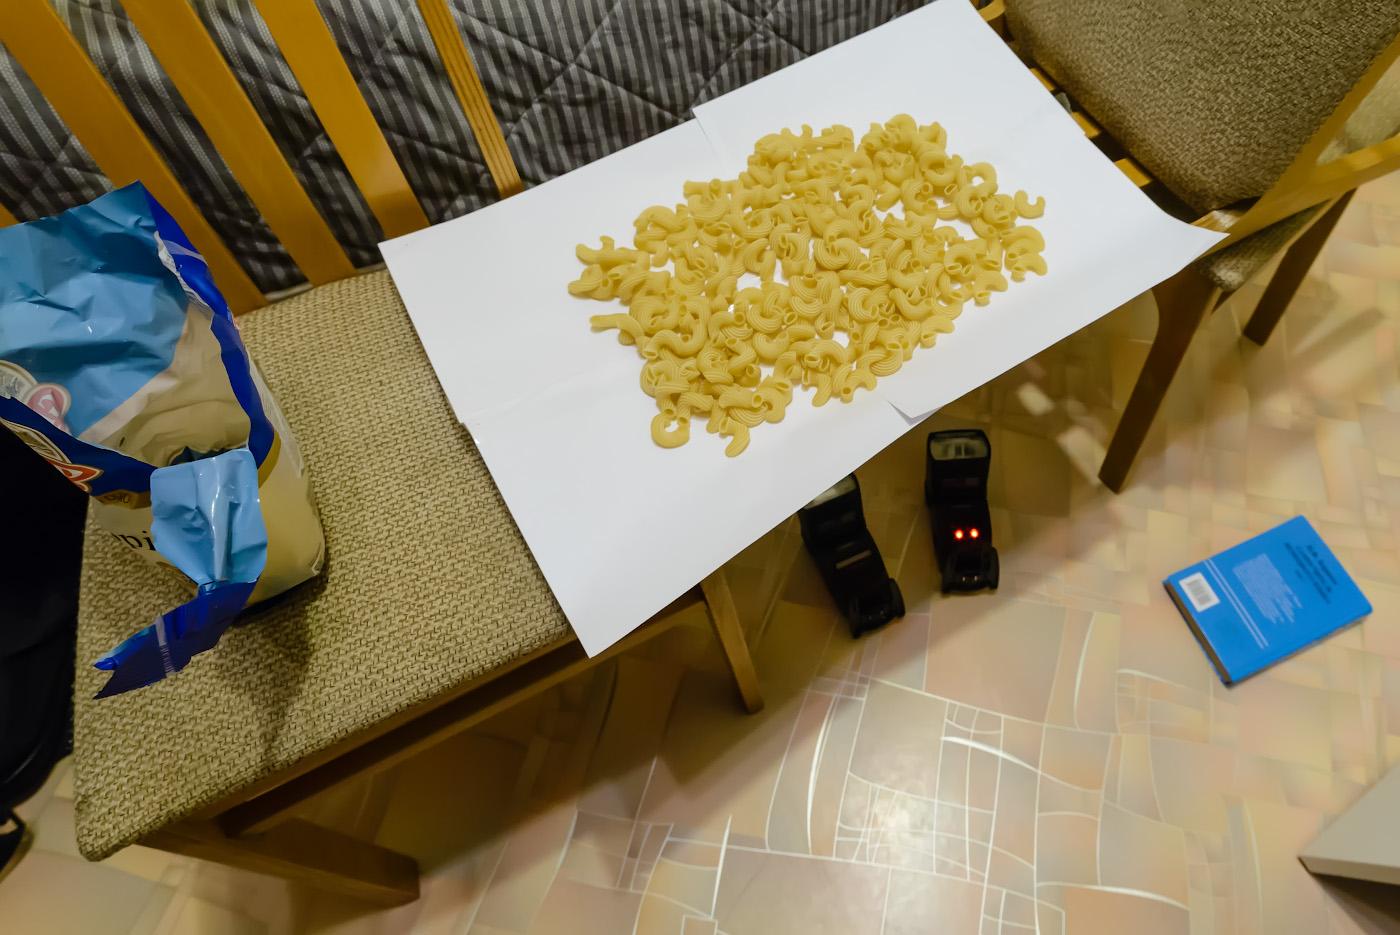 Фотография 22. Схема постановки света для натюрморта с макаронами. Снято на Nikon D610 и ширик Samyang 14mm f/2.8. Настройки: 1/30, 5.6, 2800, 14.